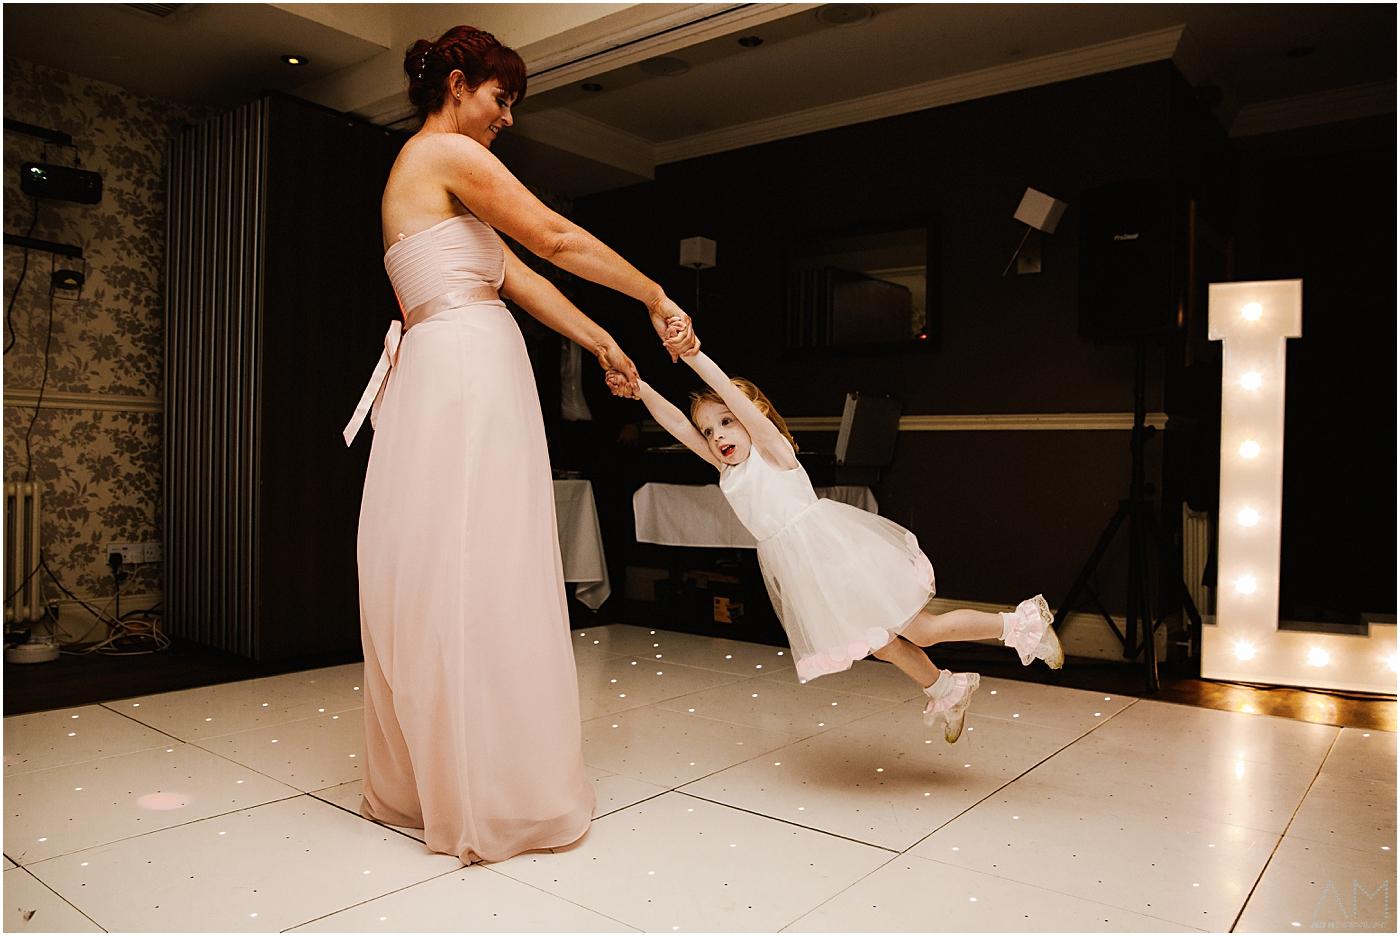 Bridesmaid swinging her daughter on danc floor